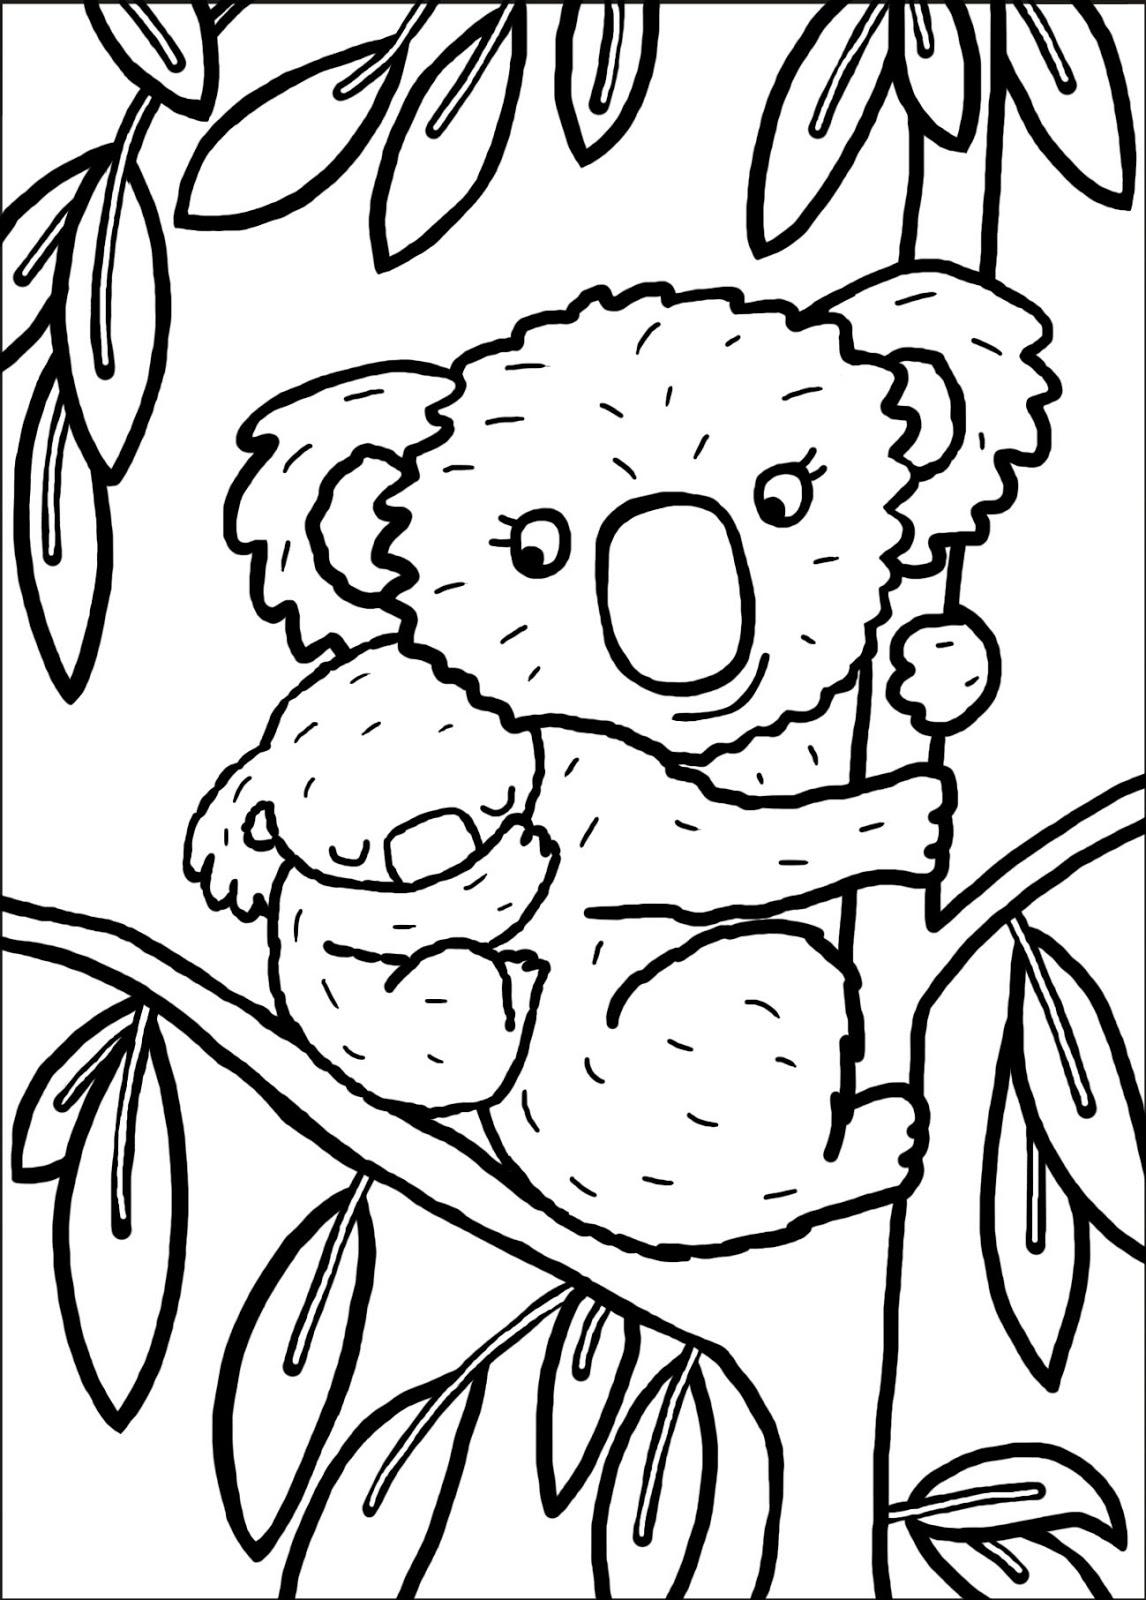 77 Dibujos De Koalas Para Colorear Oh Kids Page 4